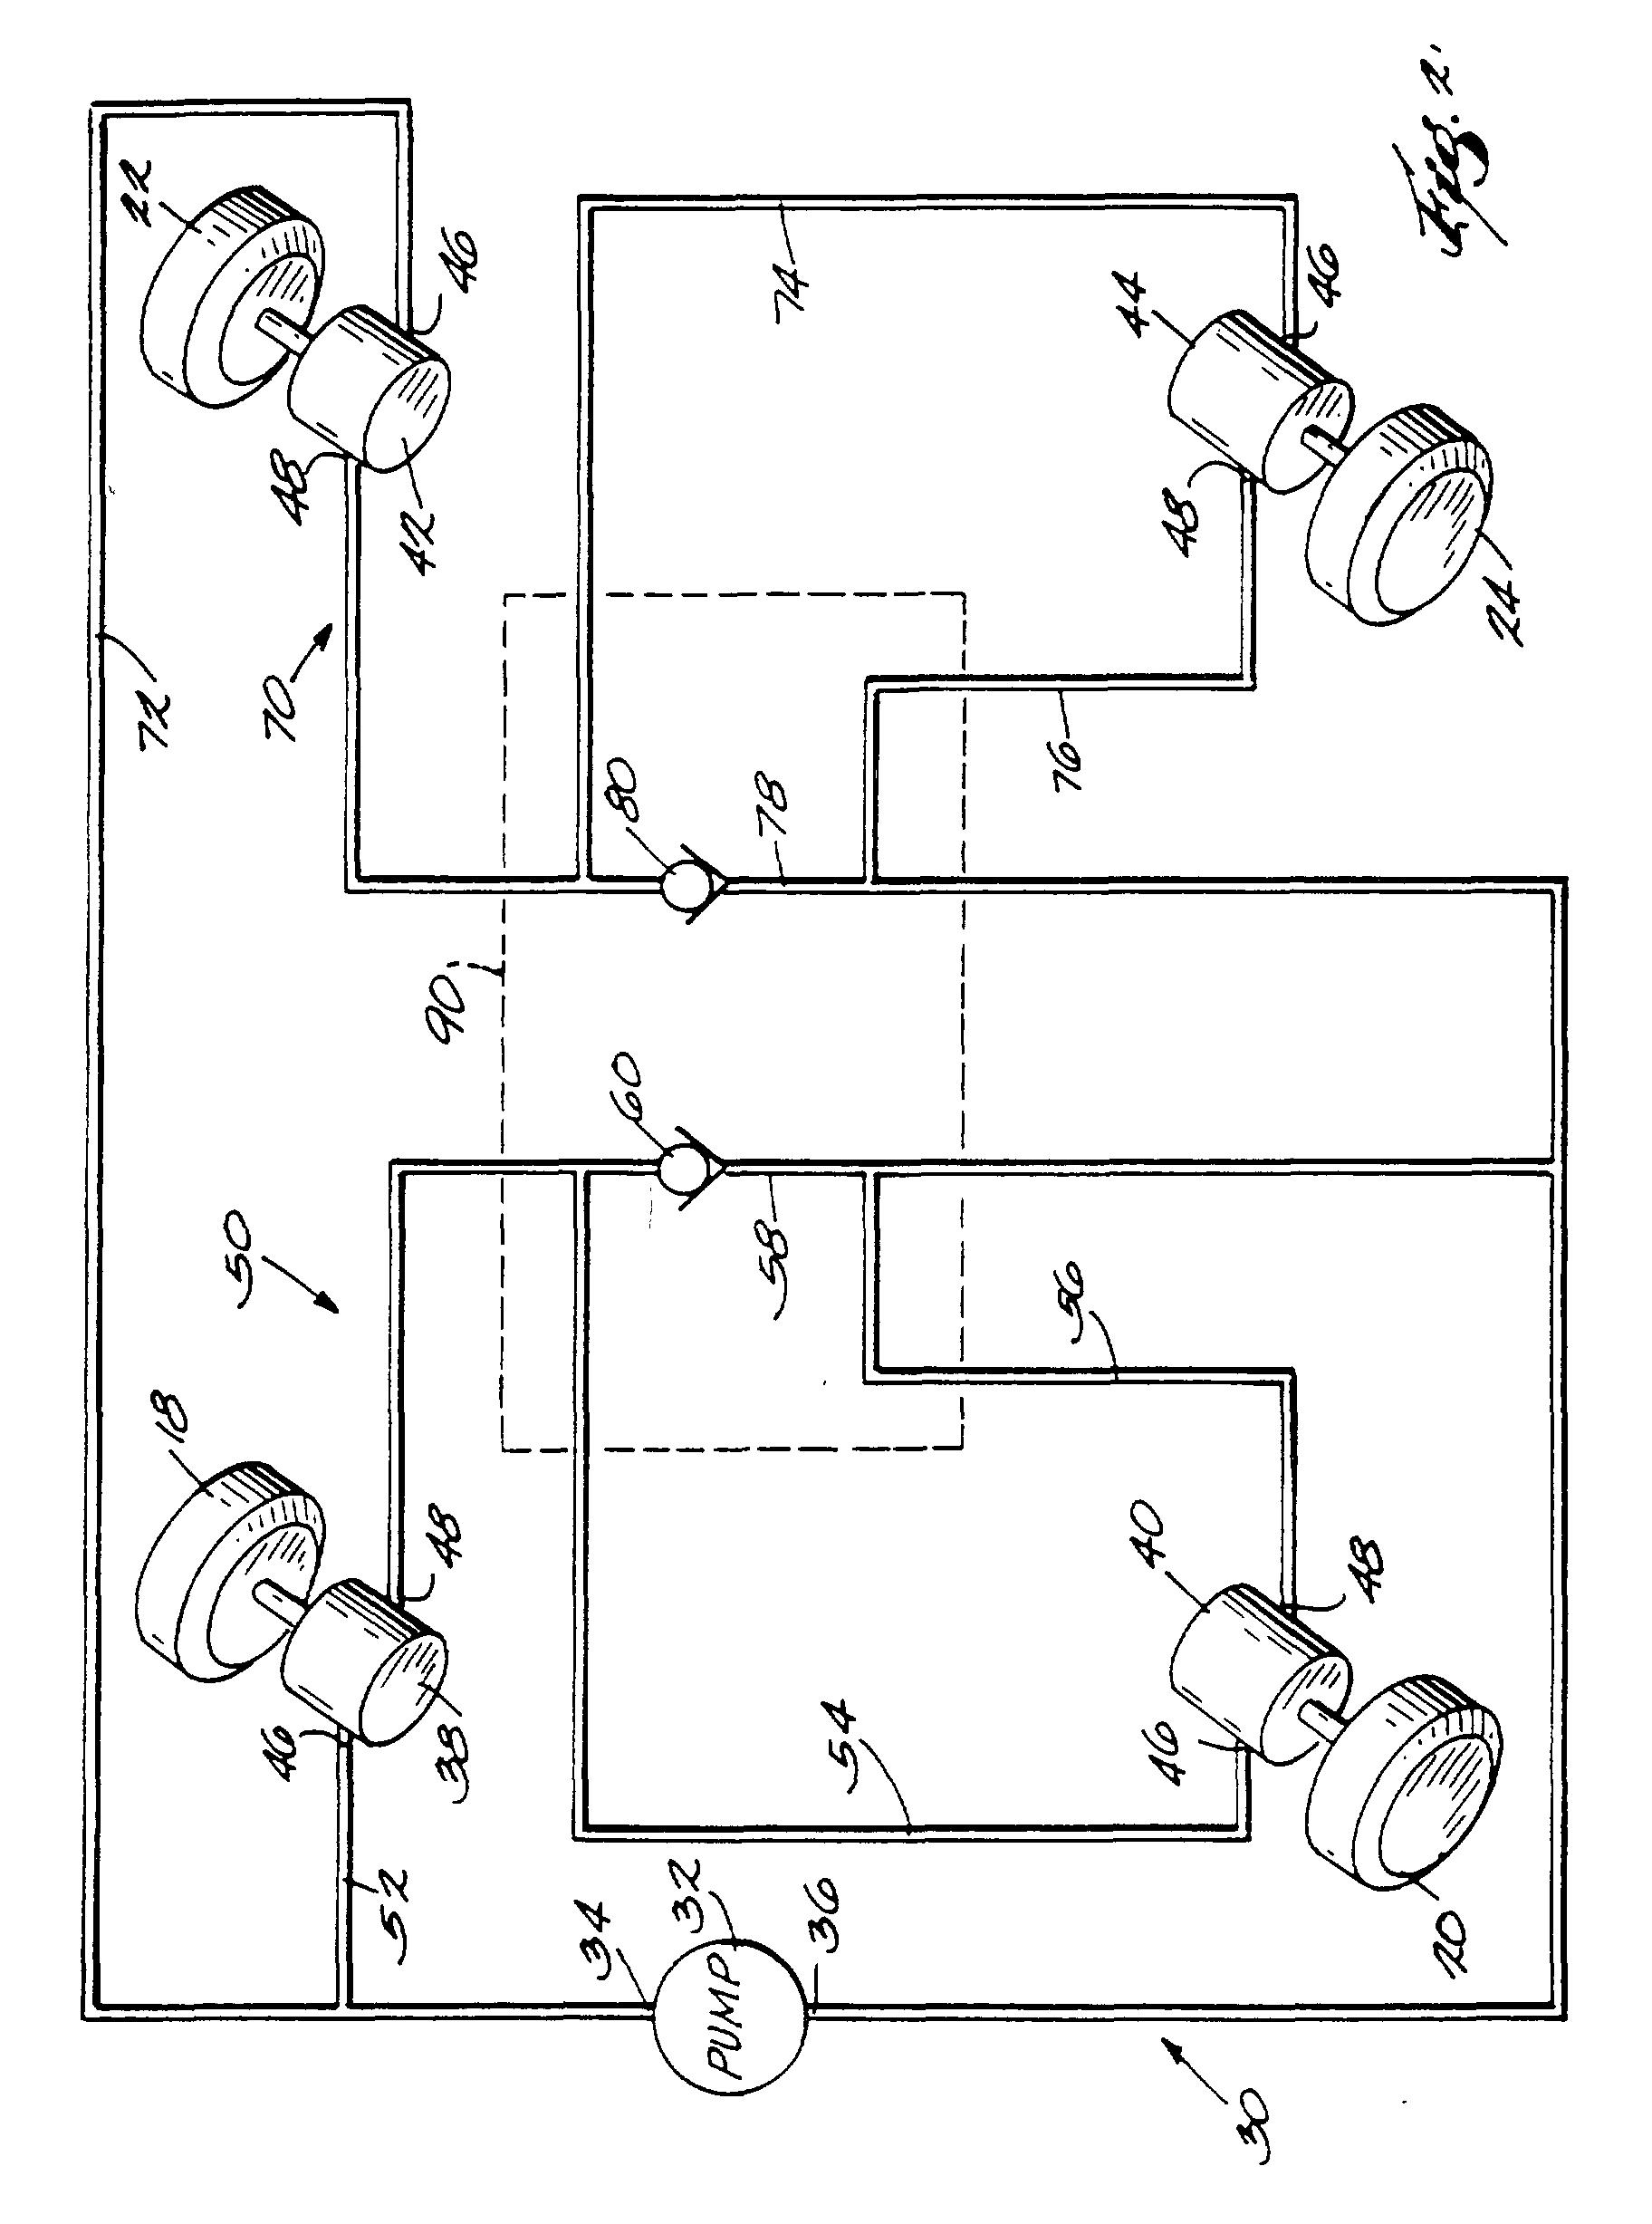 patent ep0826545b1